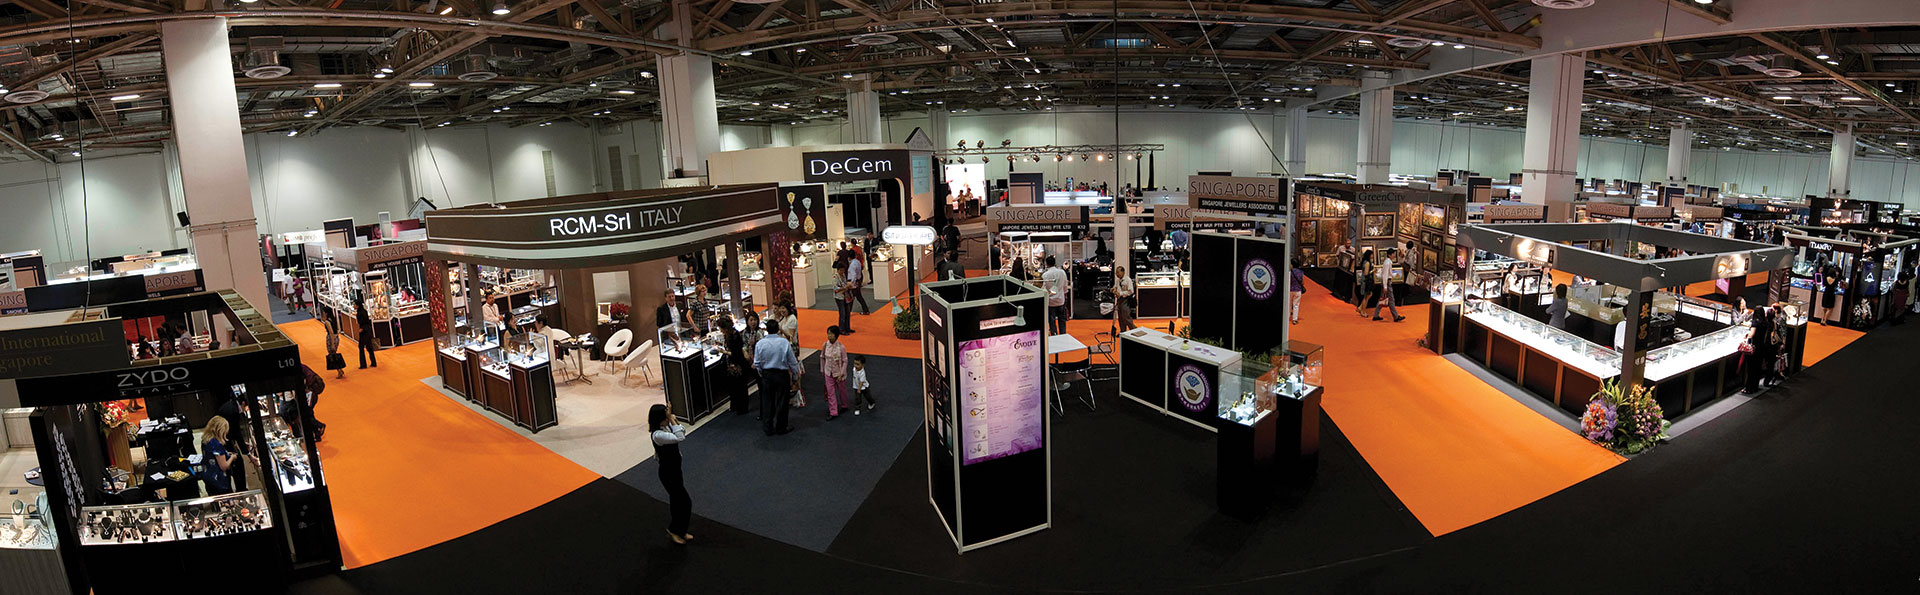 D Max Exhibition Hall : Exhibitions